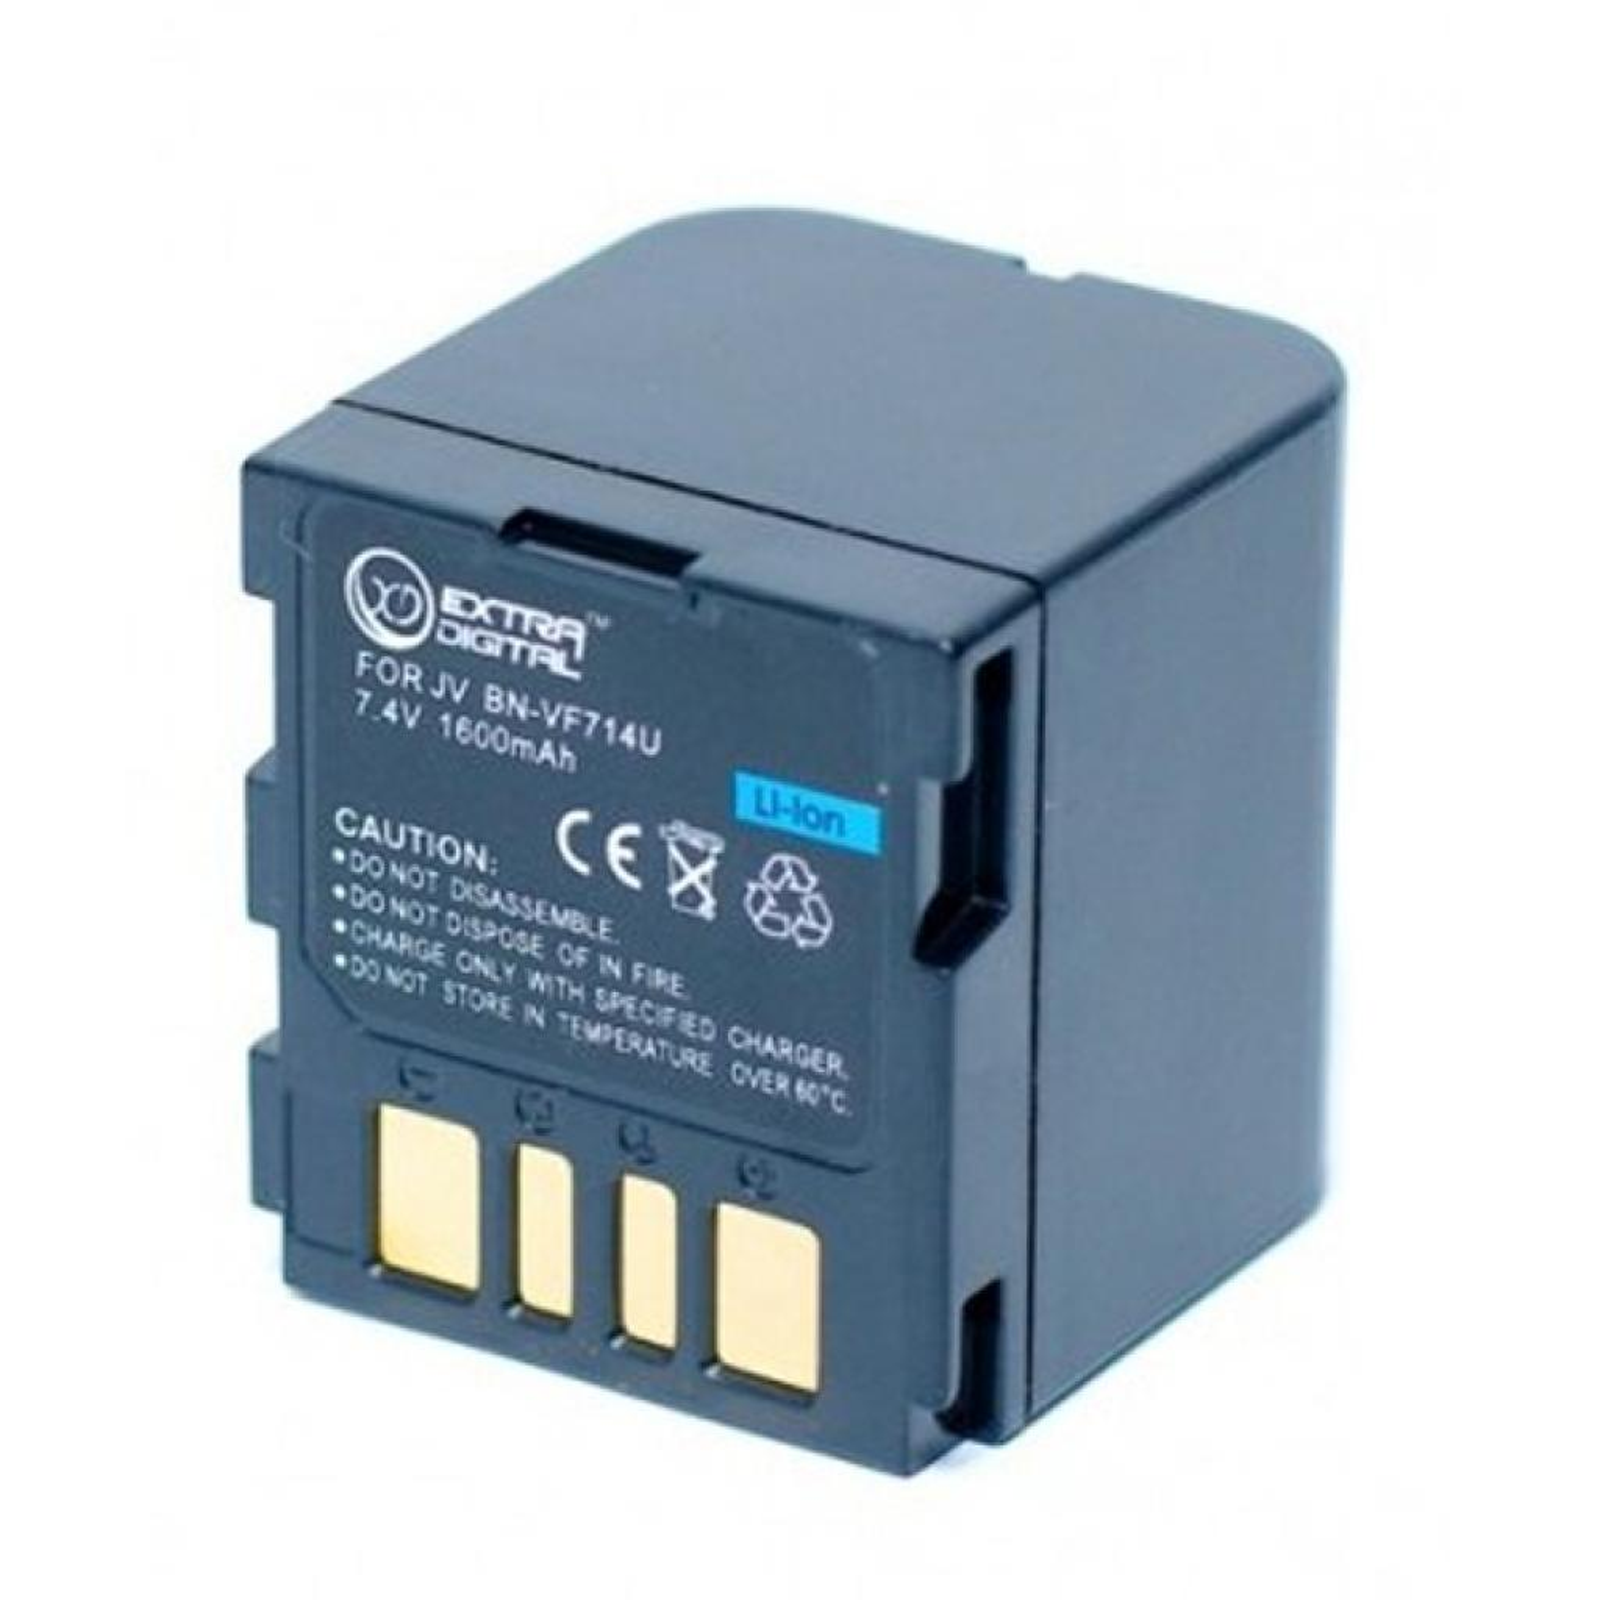 Аккумулятор к фото/видео EXTRADIGITAL JVC BN-VF714U (DV00DV1179) изображение 2